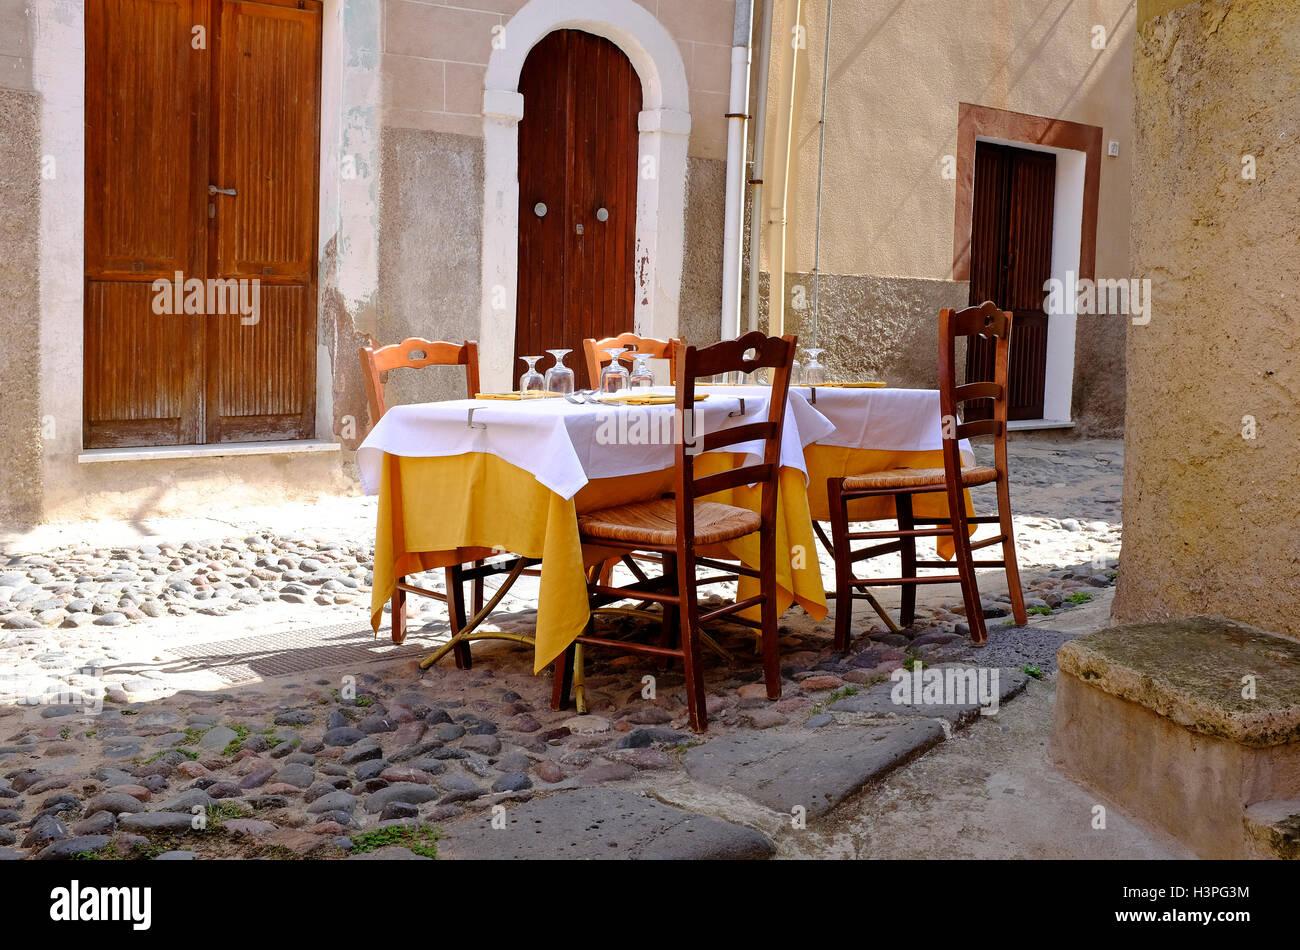 street scene outside restaurant, bosa, cerdeña, italia Foto de stock